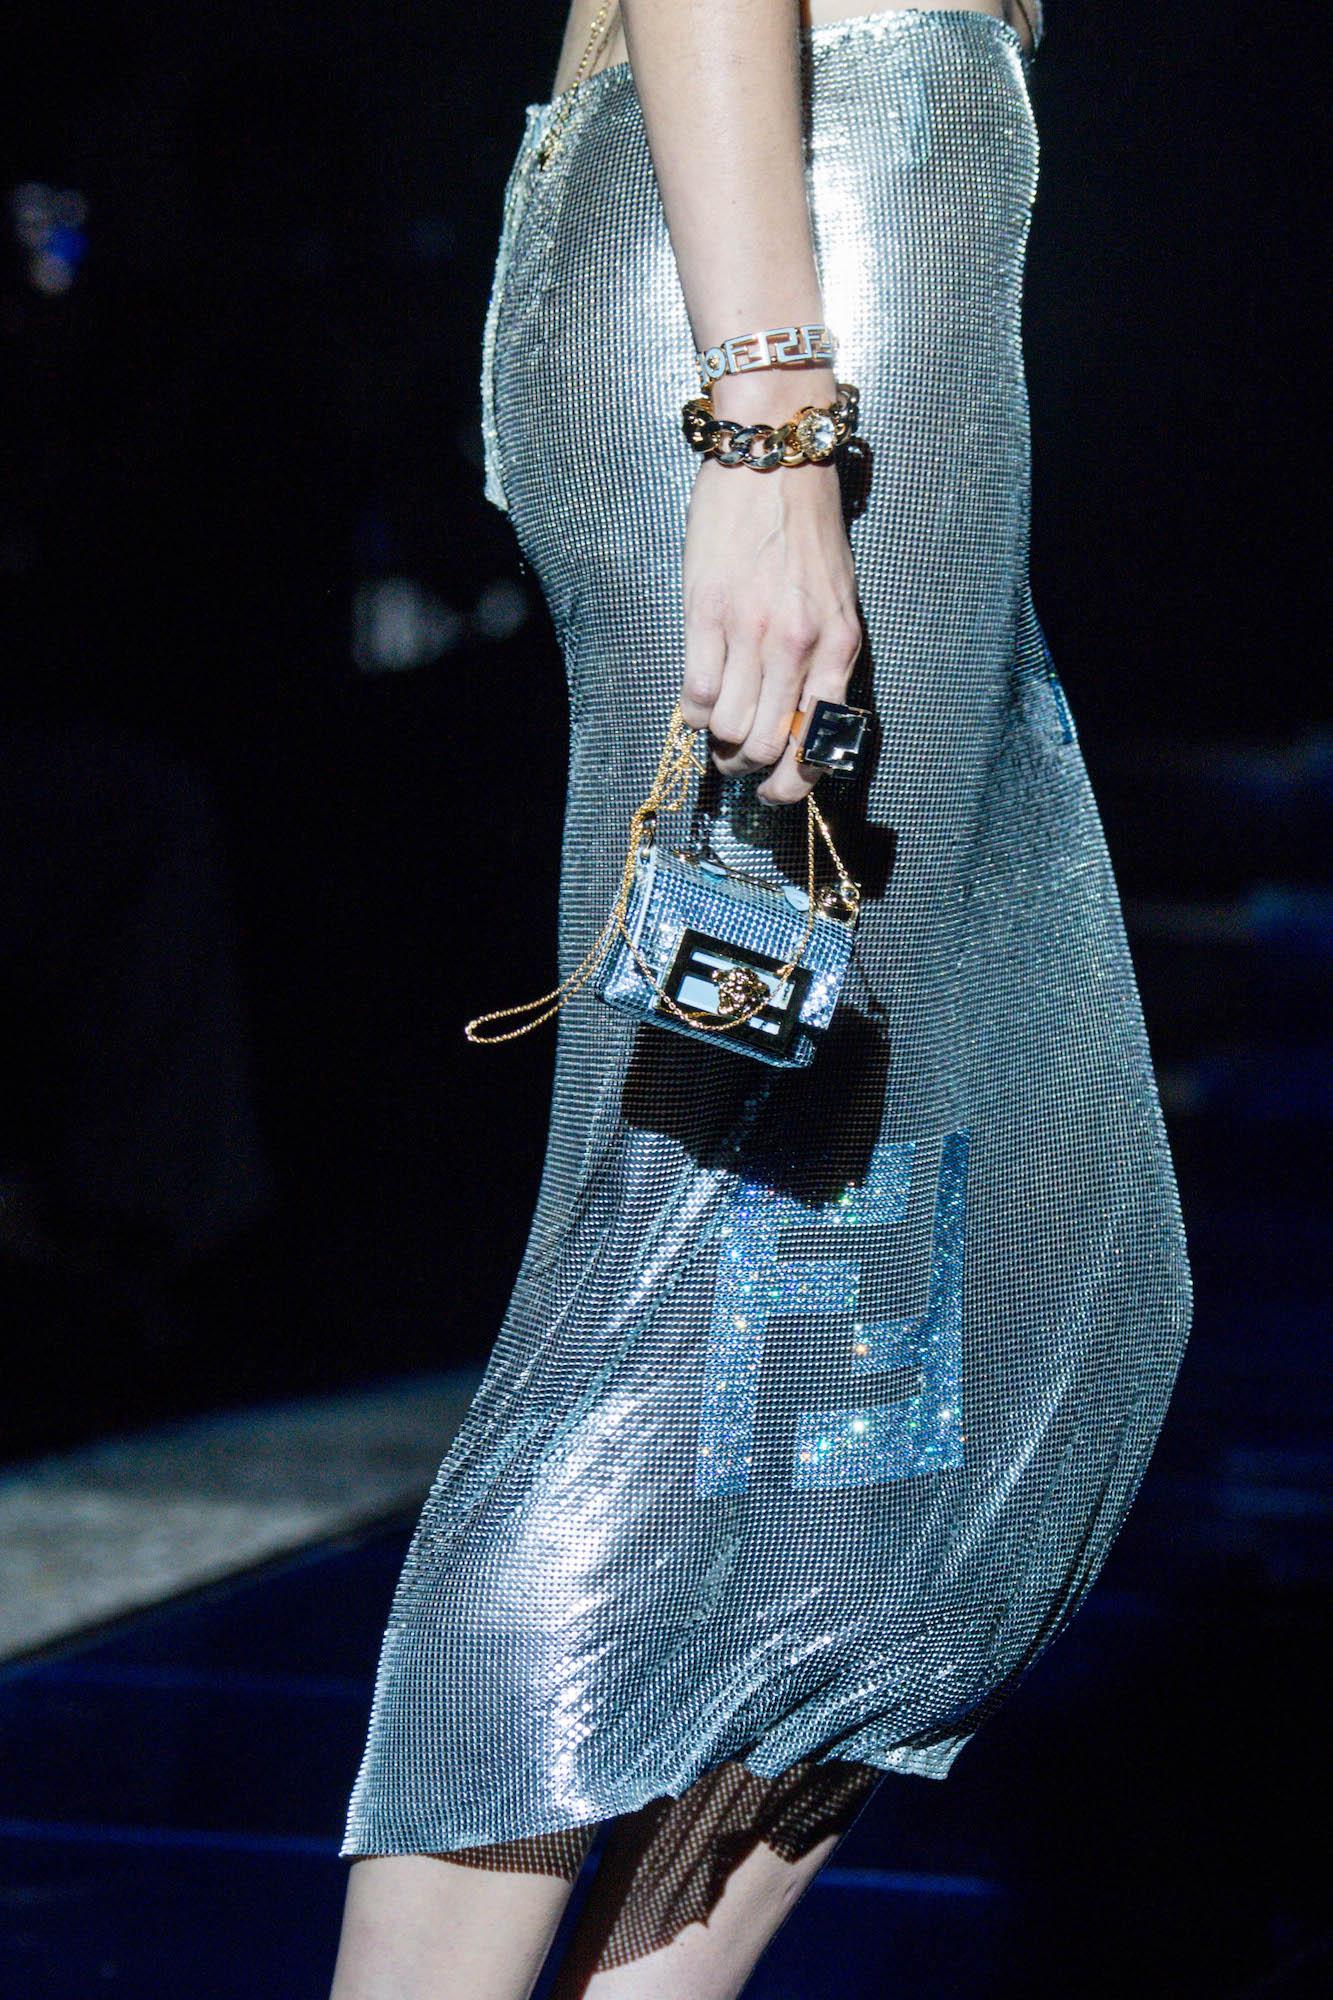 fendi by versace details (20)